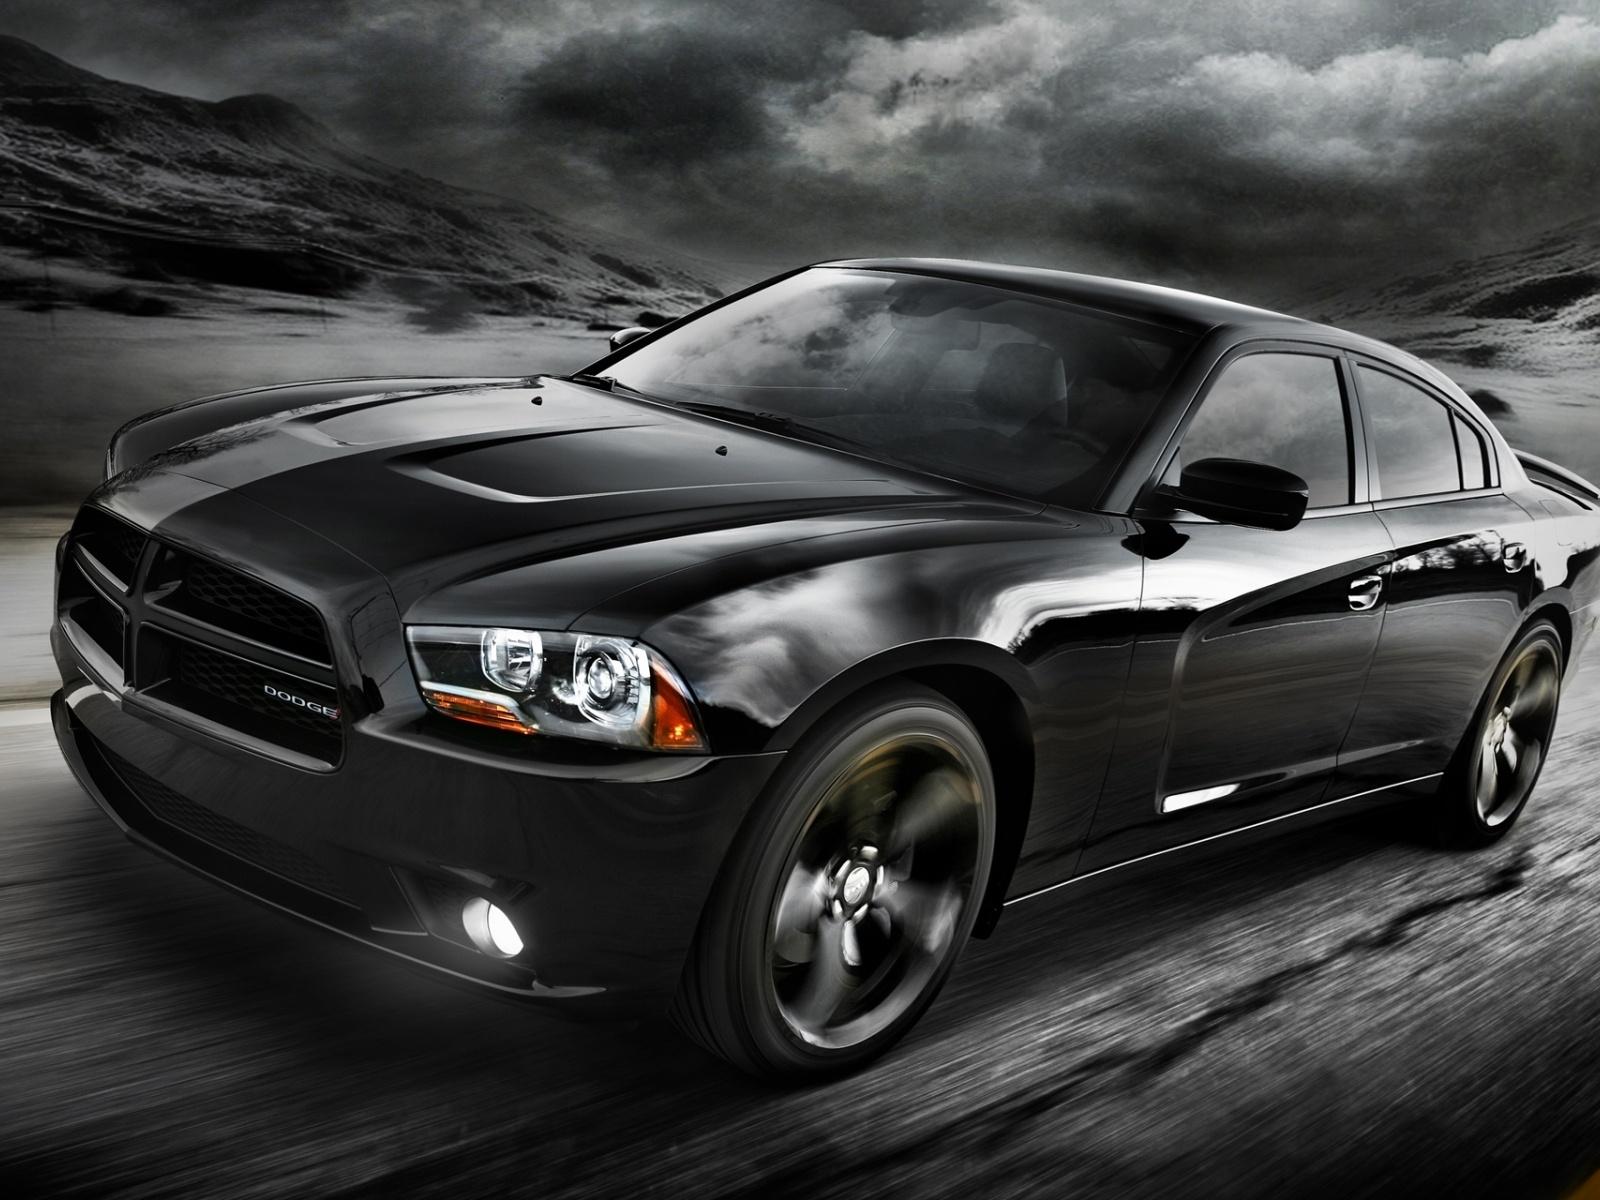 2012 dodge black car 1600x1200